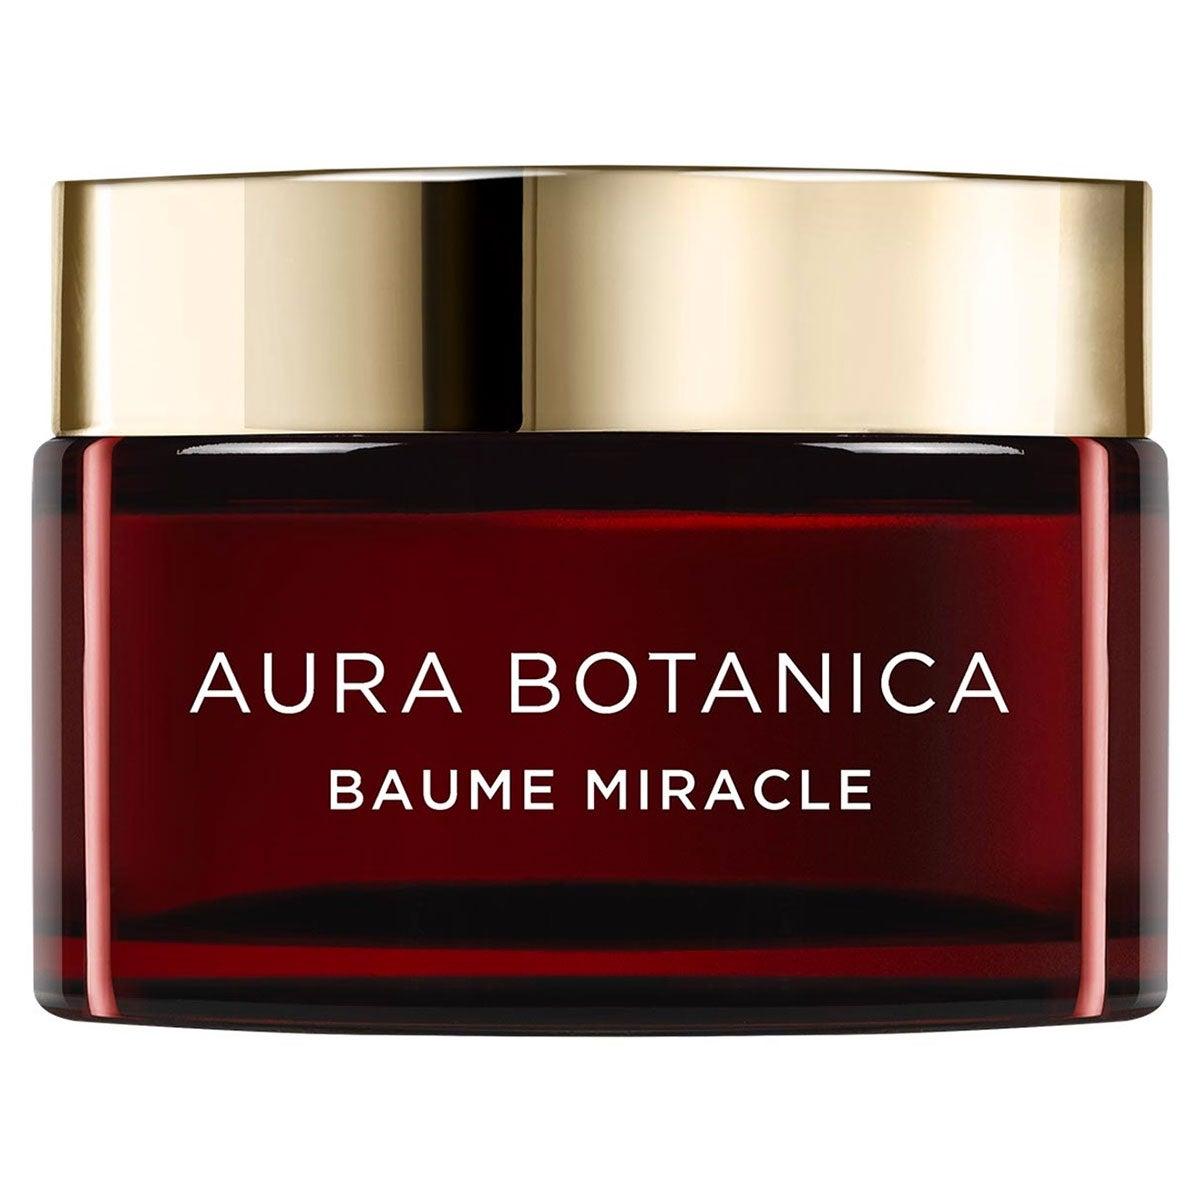 Aura Botanica Baume Miracle,  Kérastase Finishing